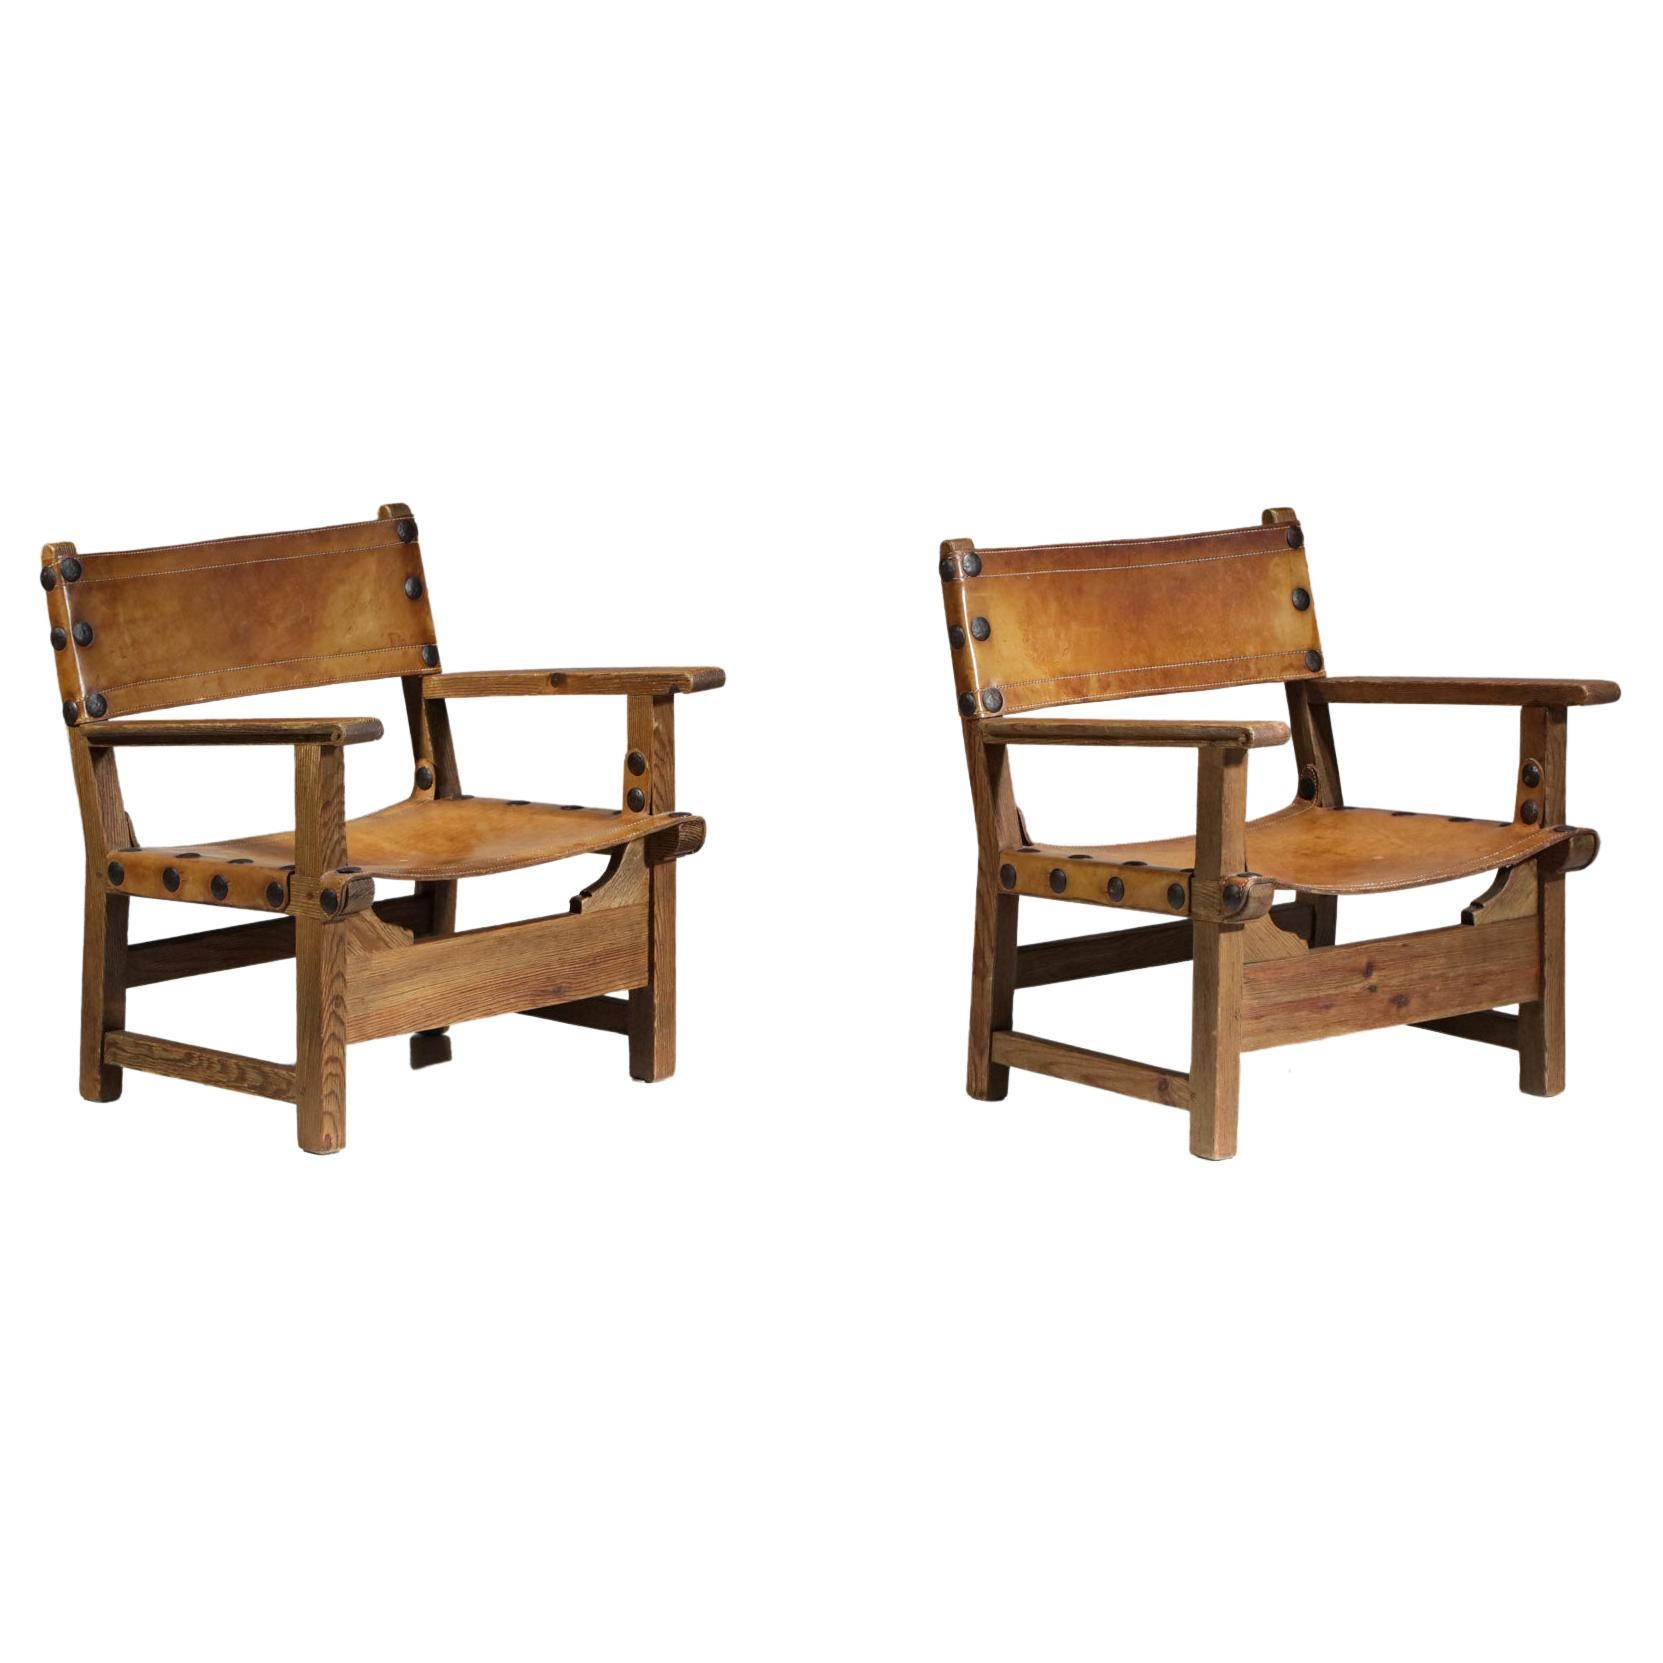 "Pair of Scandinavian Solid Wood ""Safari"" Style Armchairs, Vintage Design"